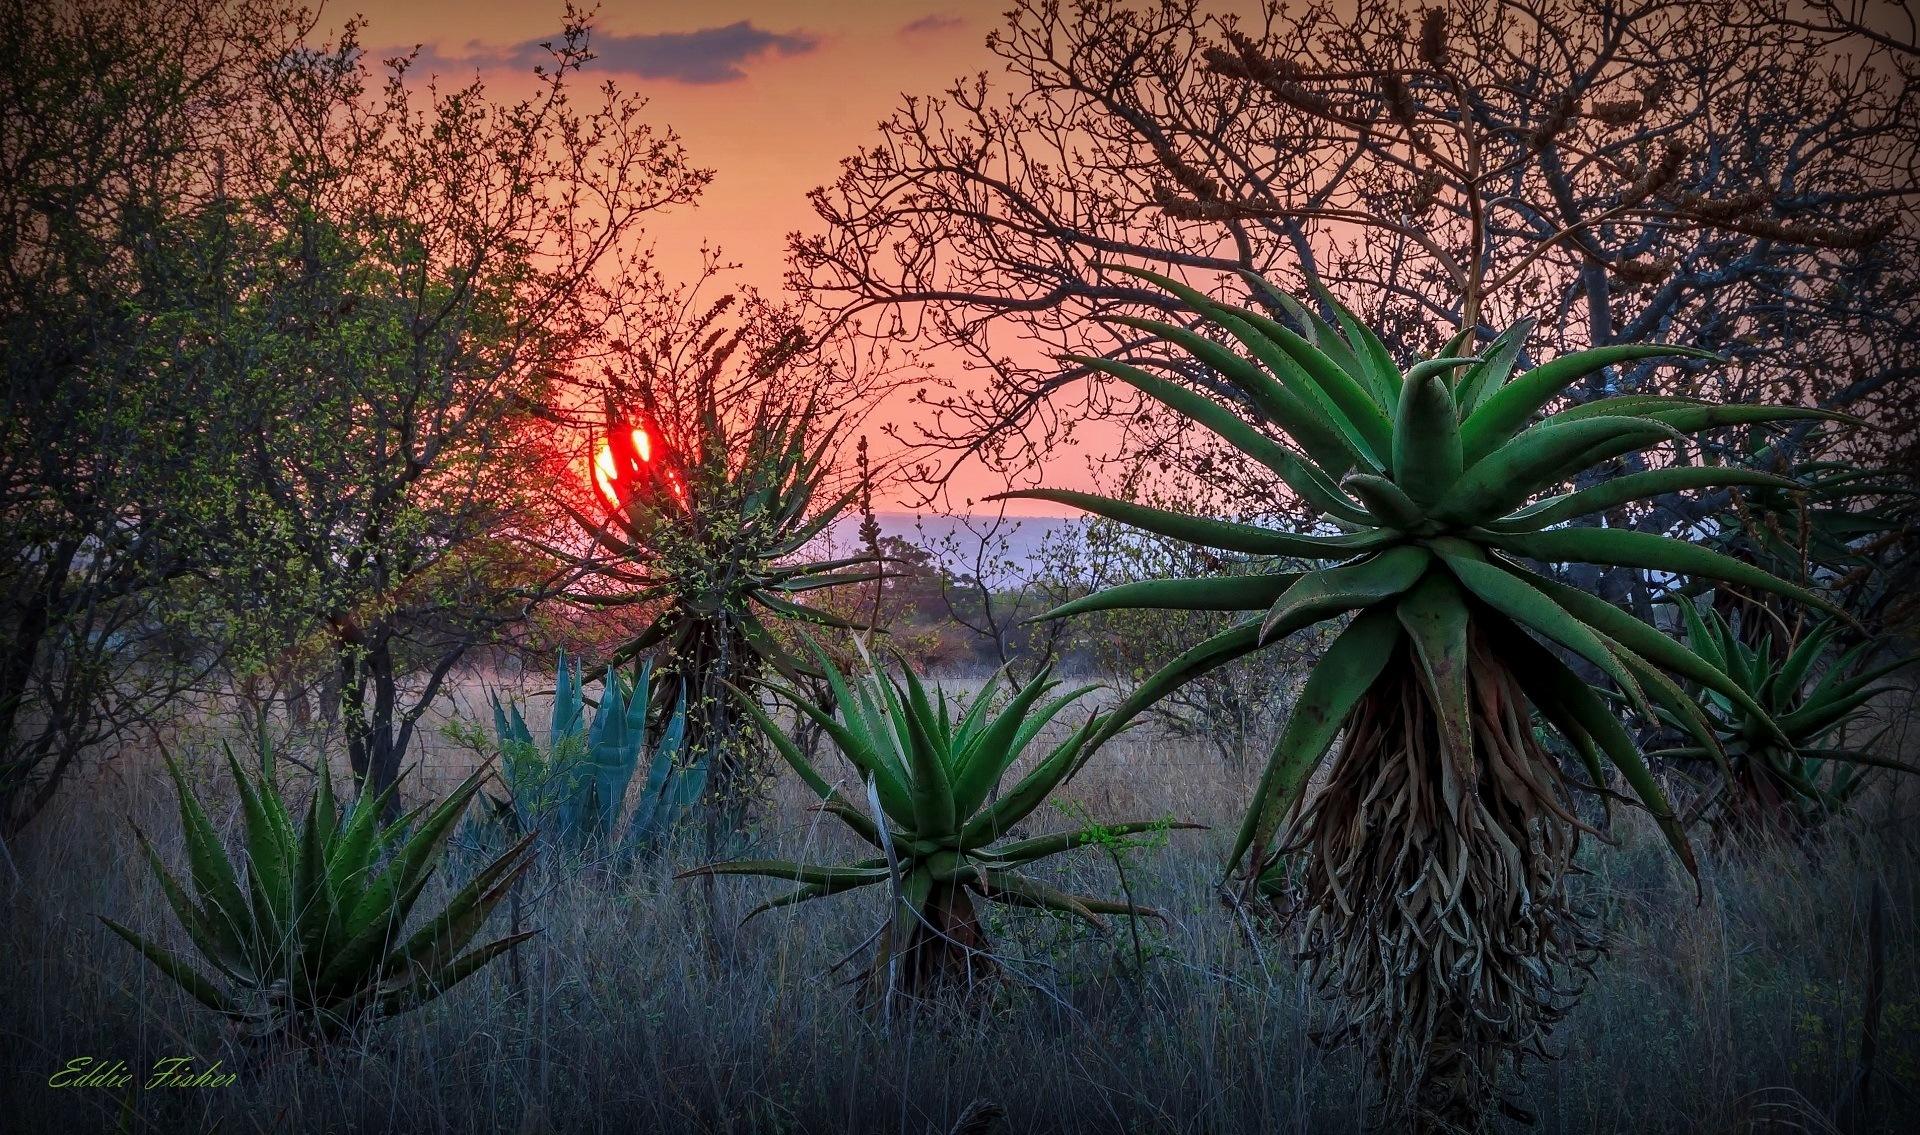 Aloe Sunset 2 by eddie.fisher.509